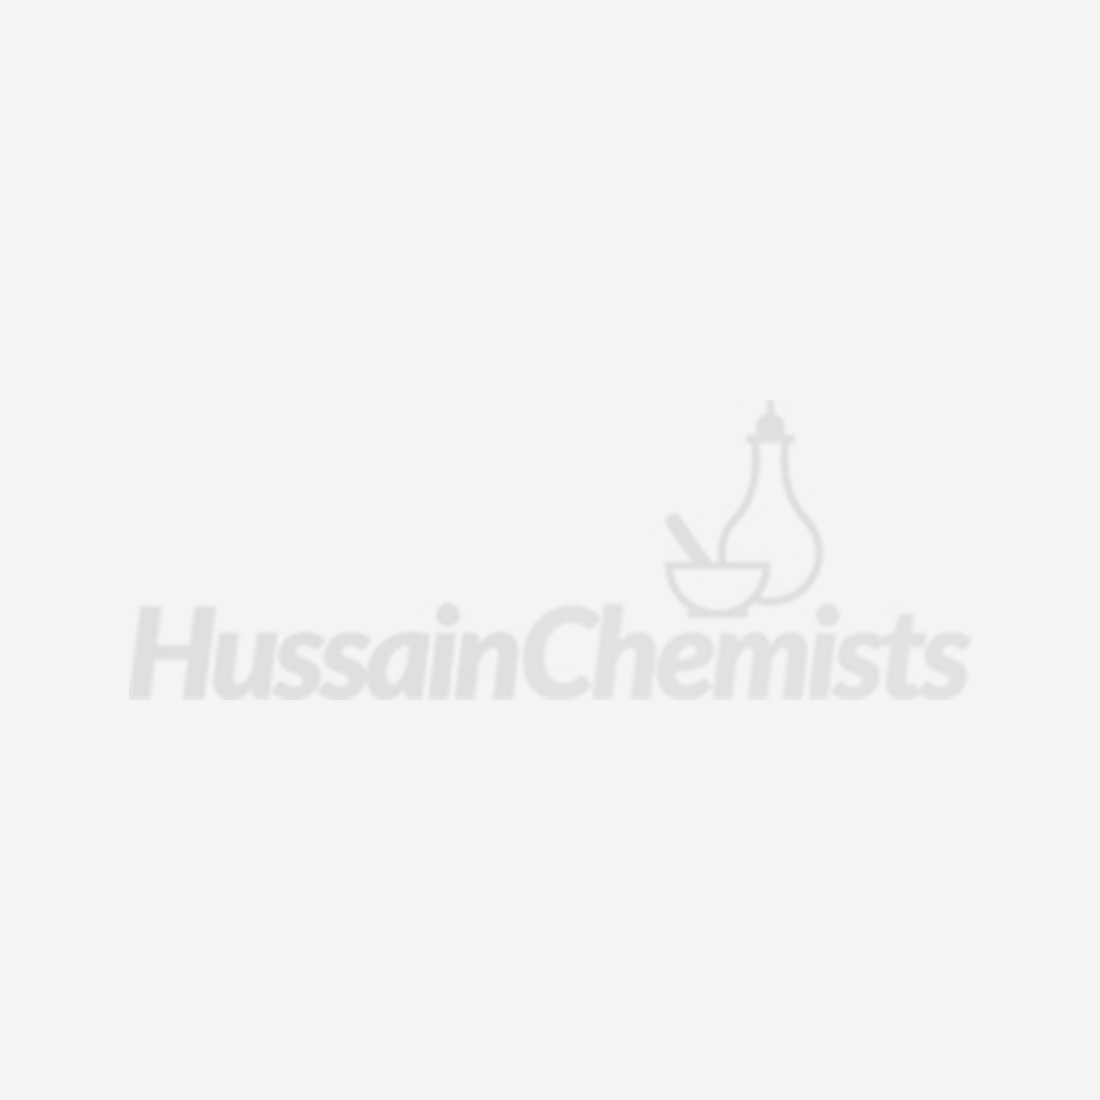 Hydrocortisone 1% w/w Cream 15g